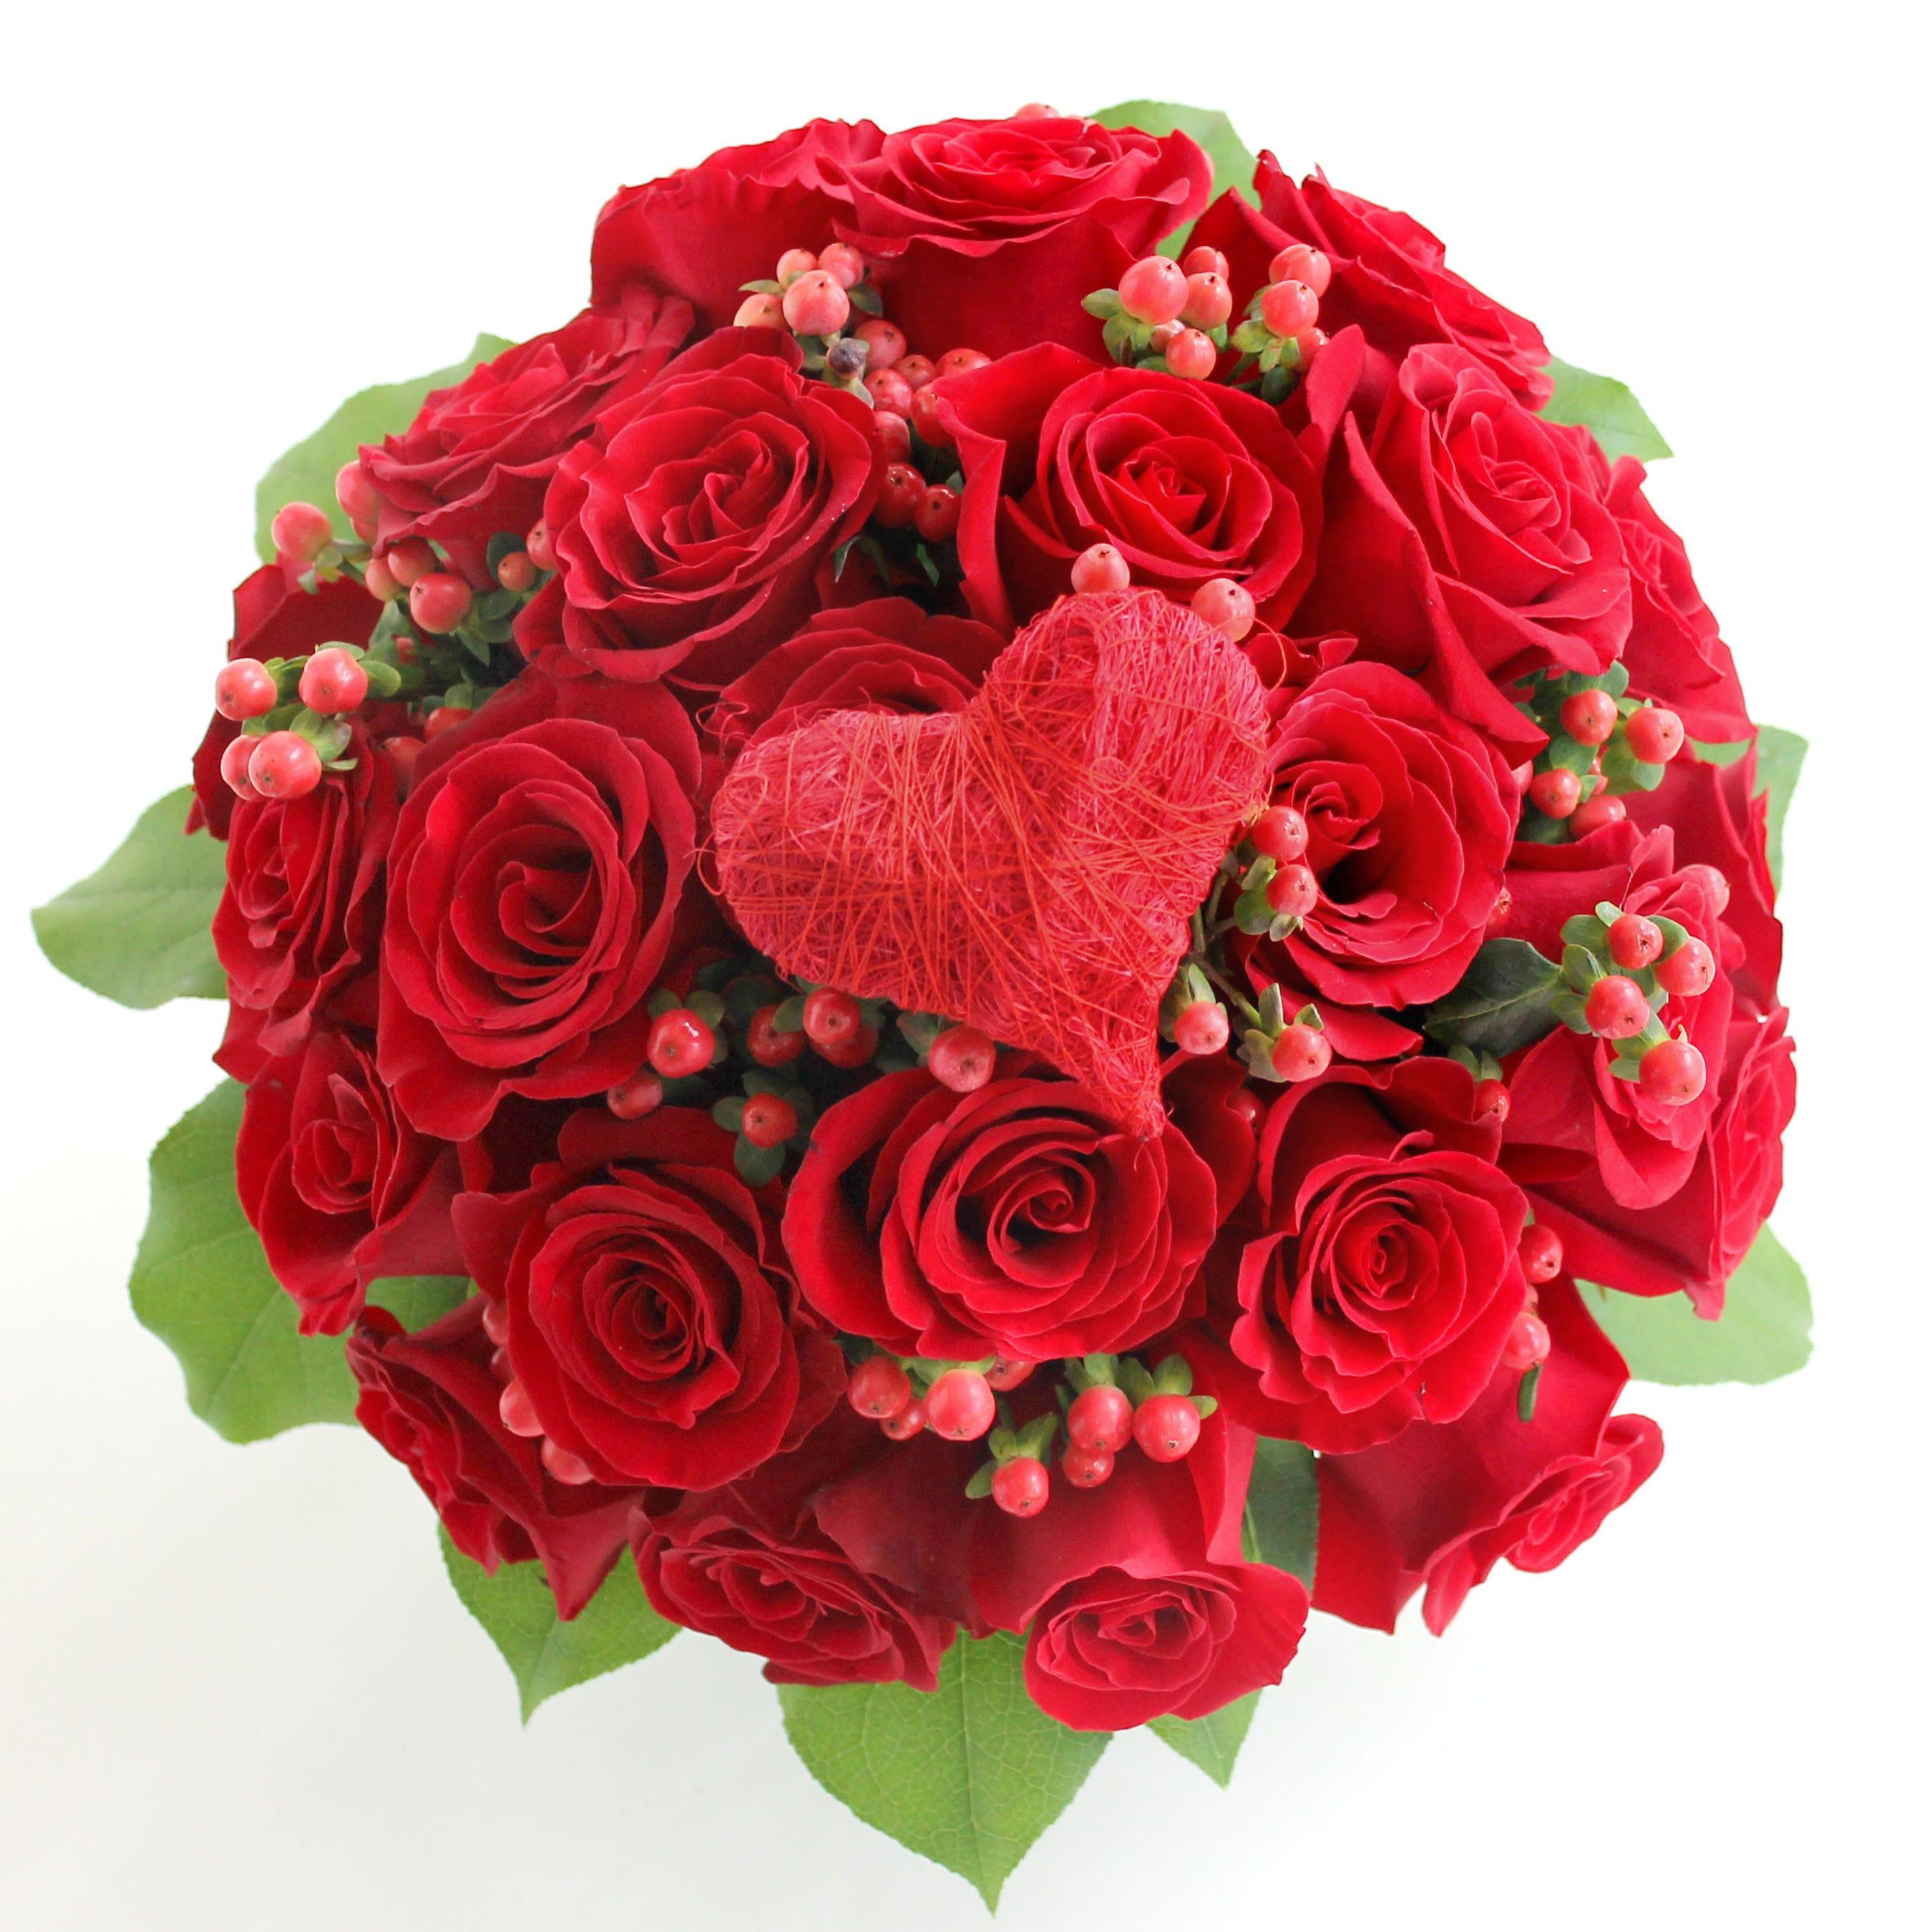 True Love Rose Bouquet by BowKay.com